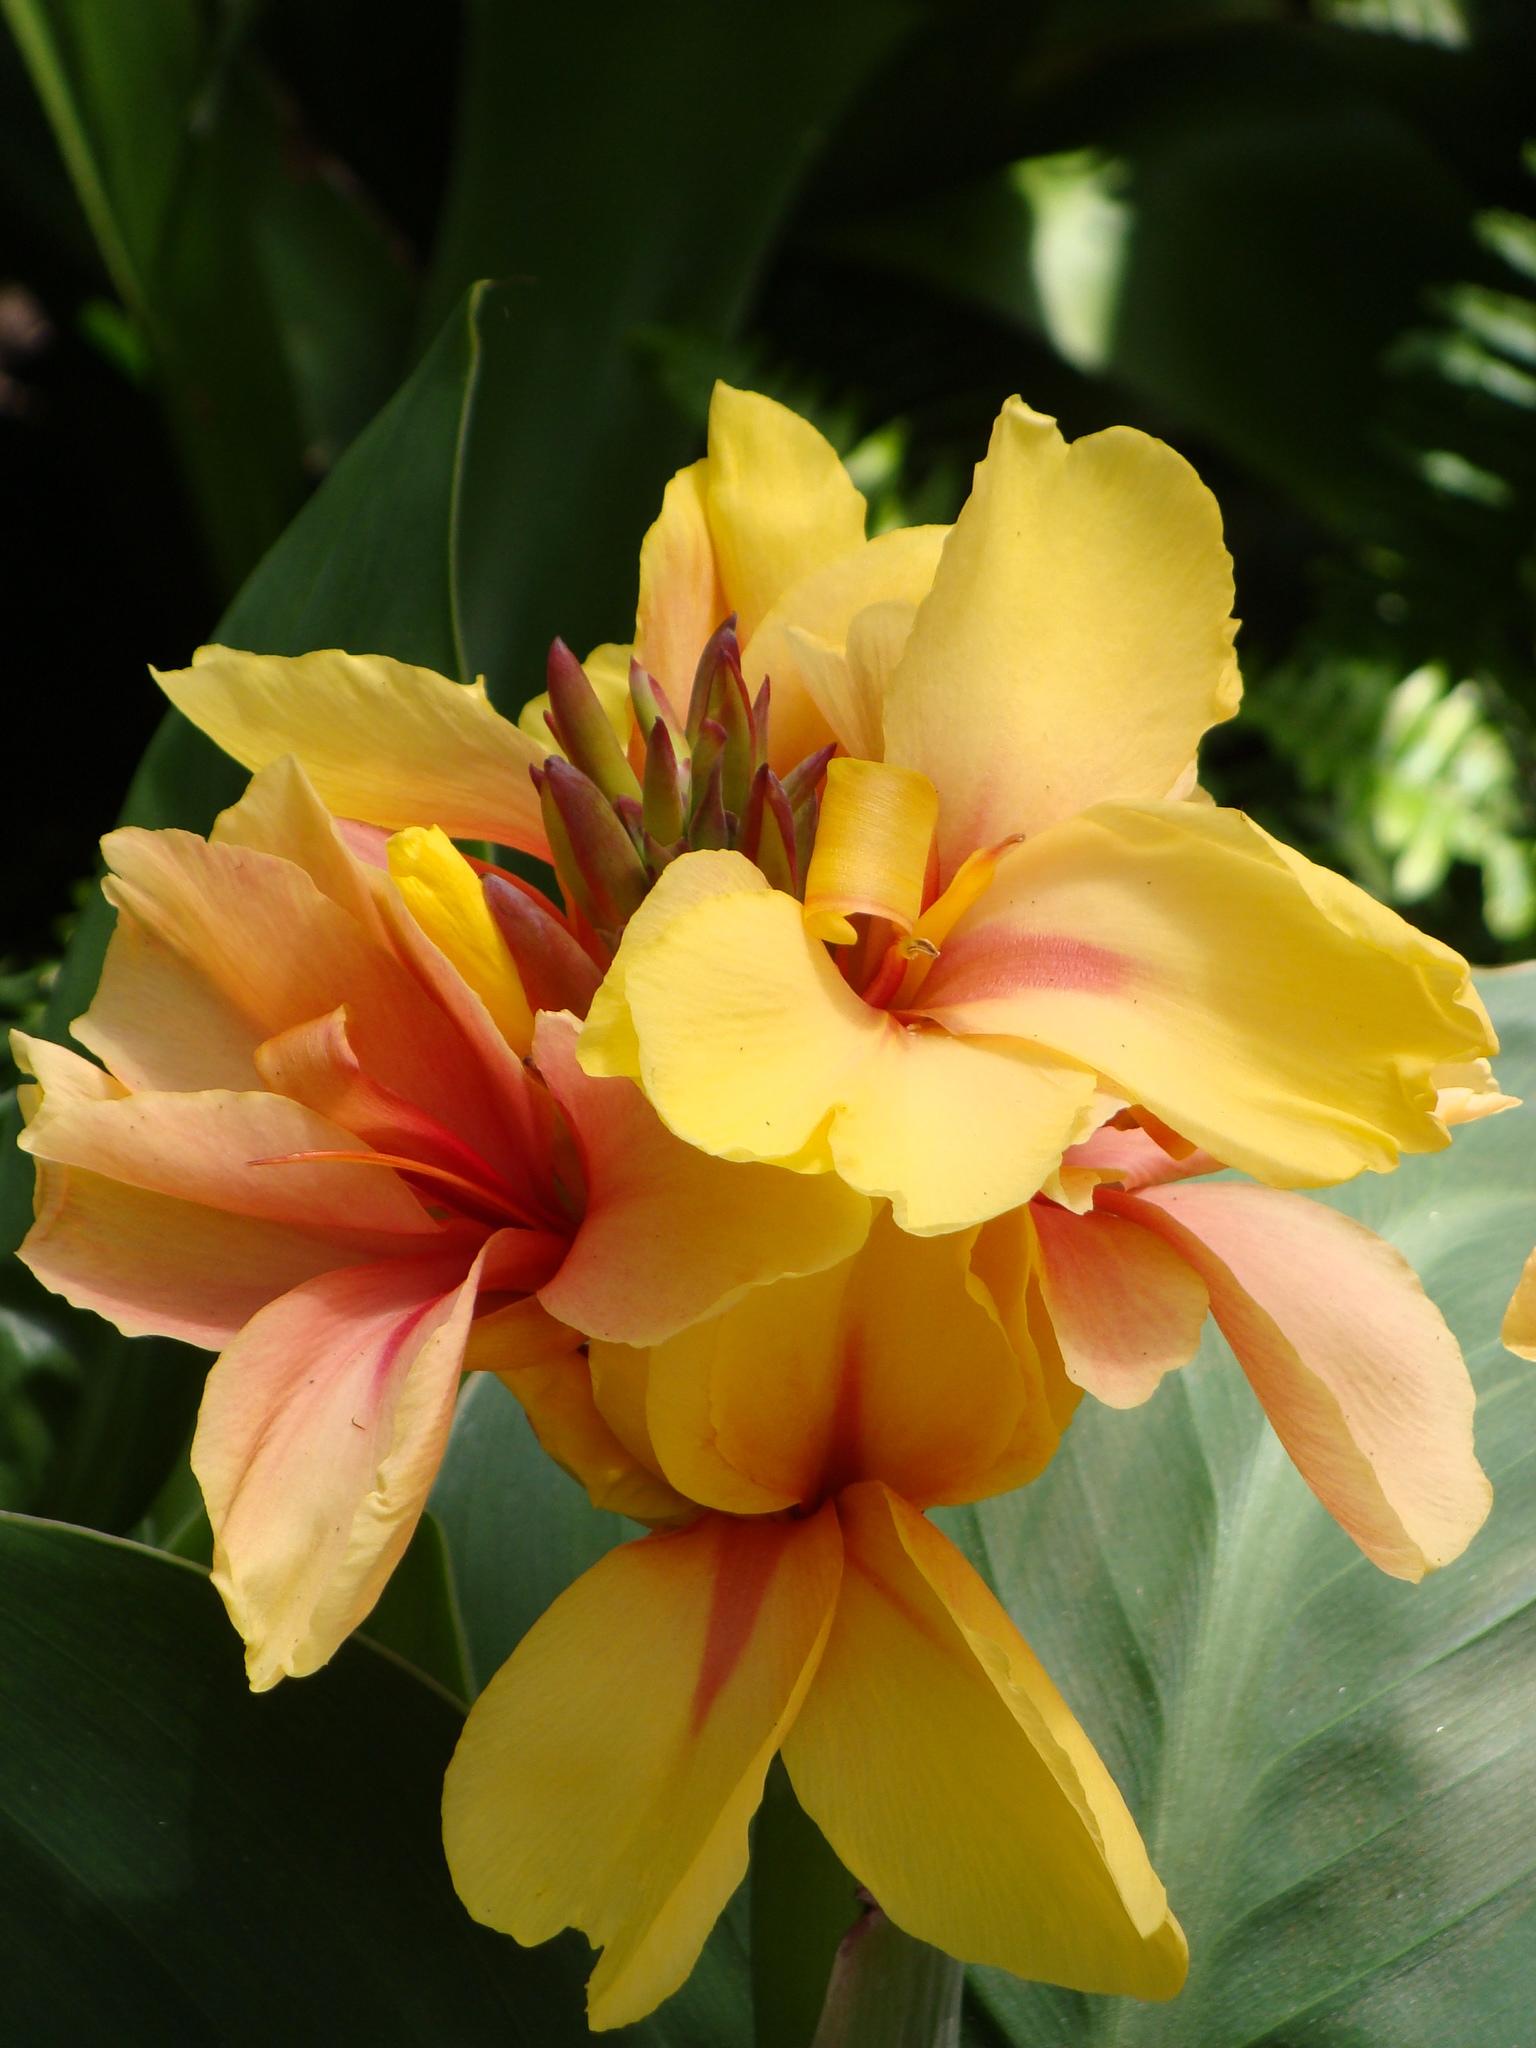 2 Canna lily Red Yellow Paniculata flower green foliage bulbs//rhizomes Medium